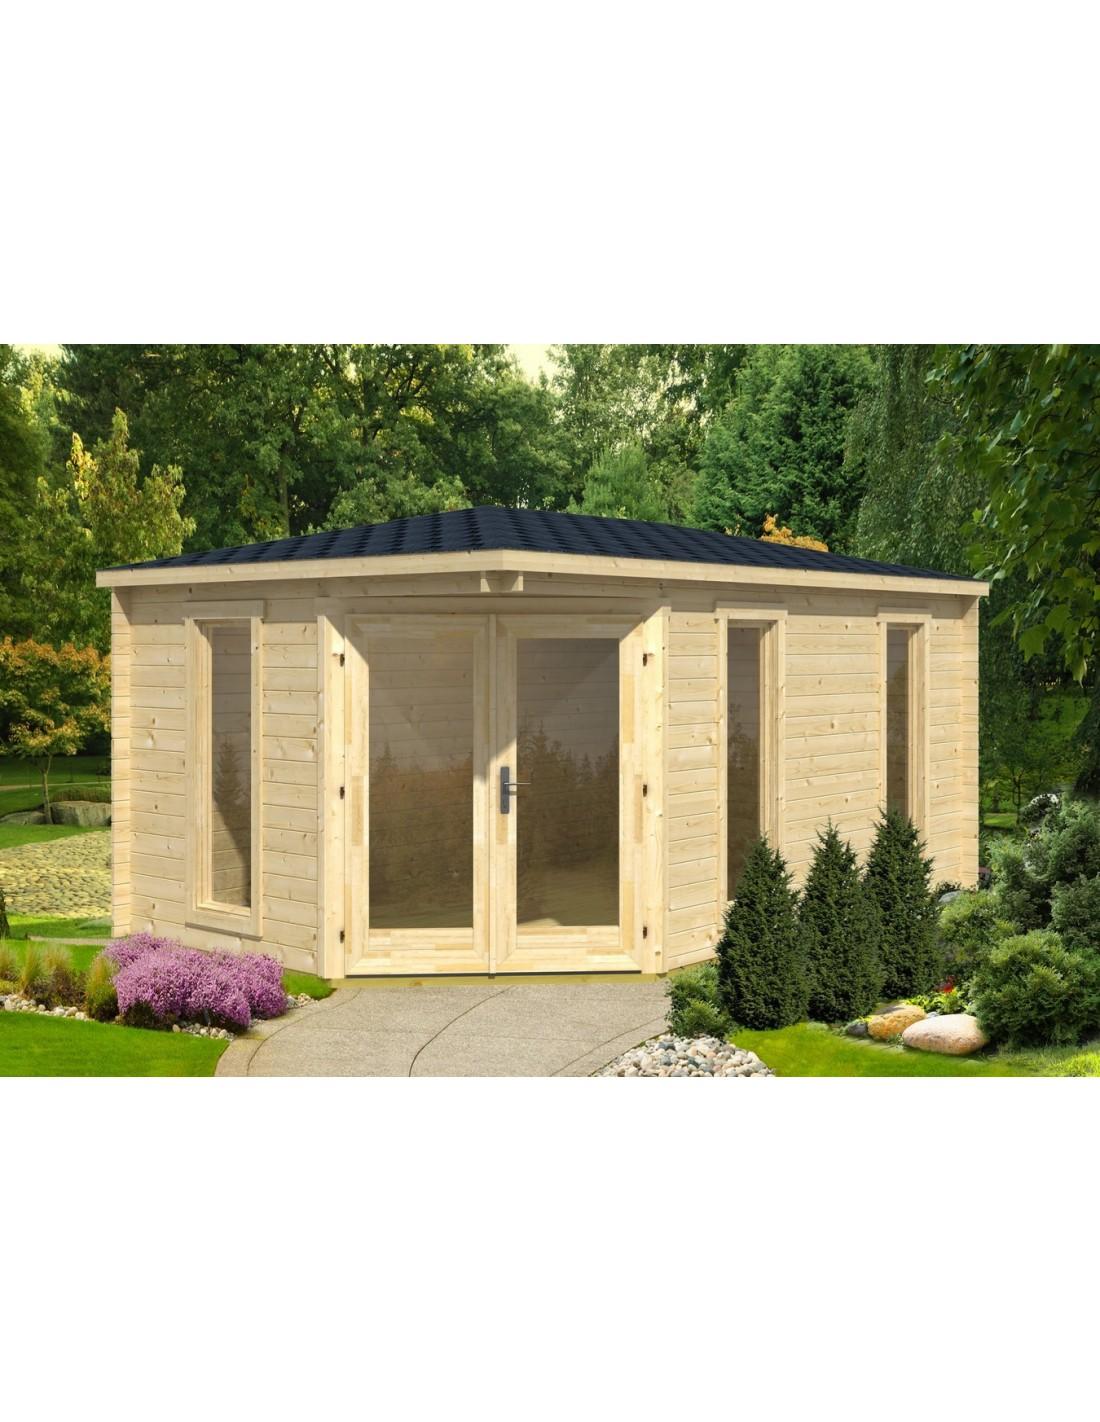 abri de jardin edinburgh 12 5 m avec plancher bois. Black Bedroom Furniture Sets. Home Design Ideas